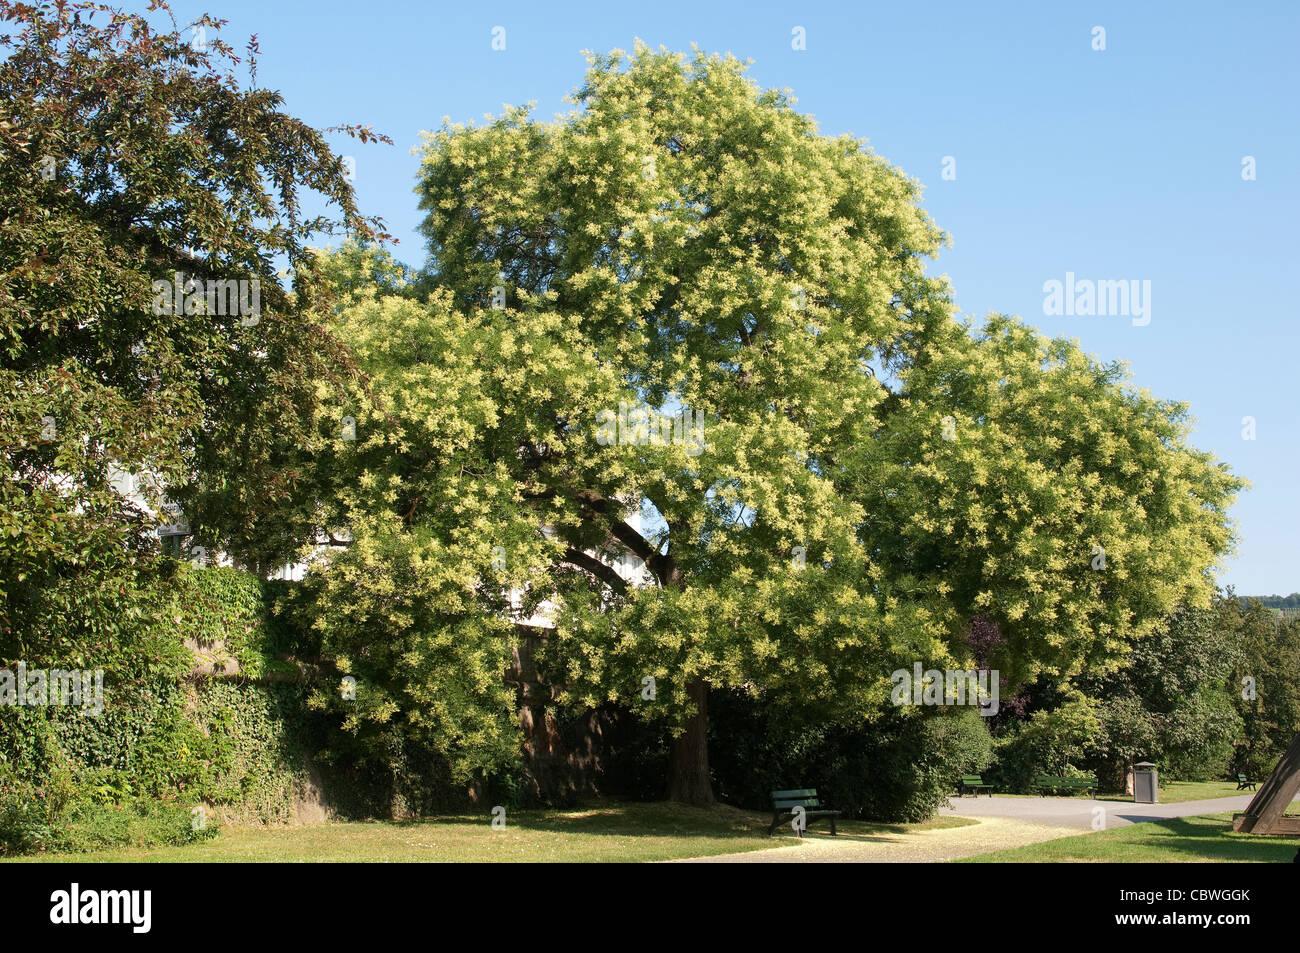 styphnolobium japonicum arbre pagode, sophora japonica), arbre en